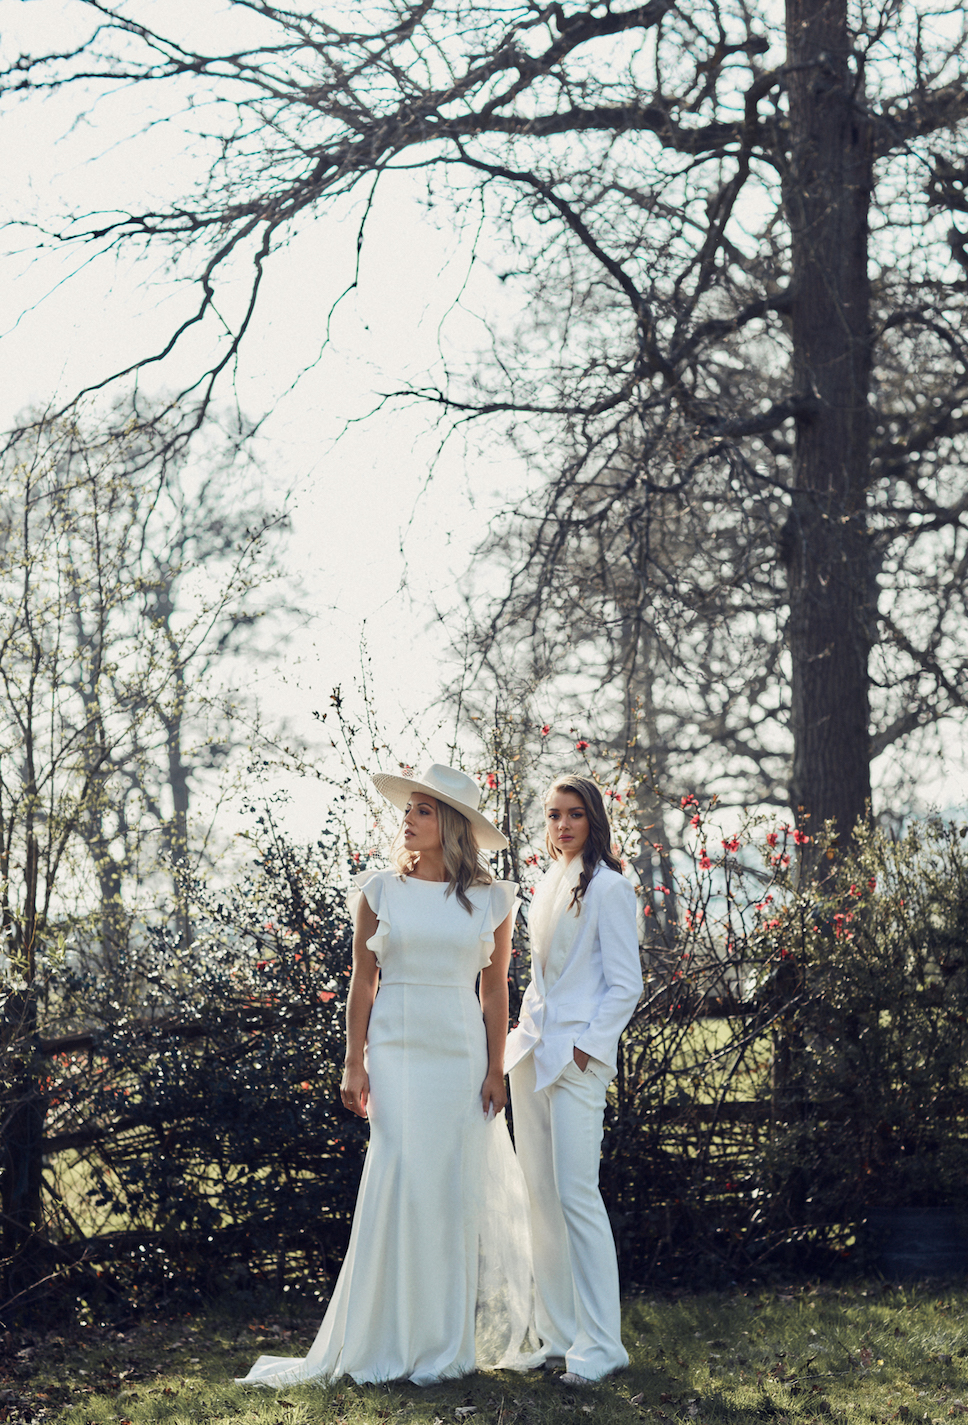 TH&TH bridesmaids